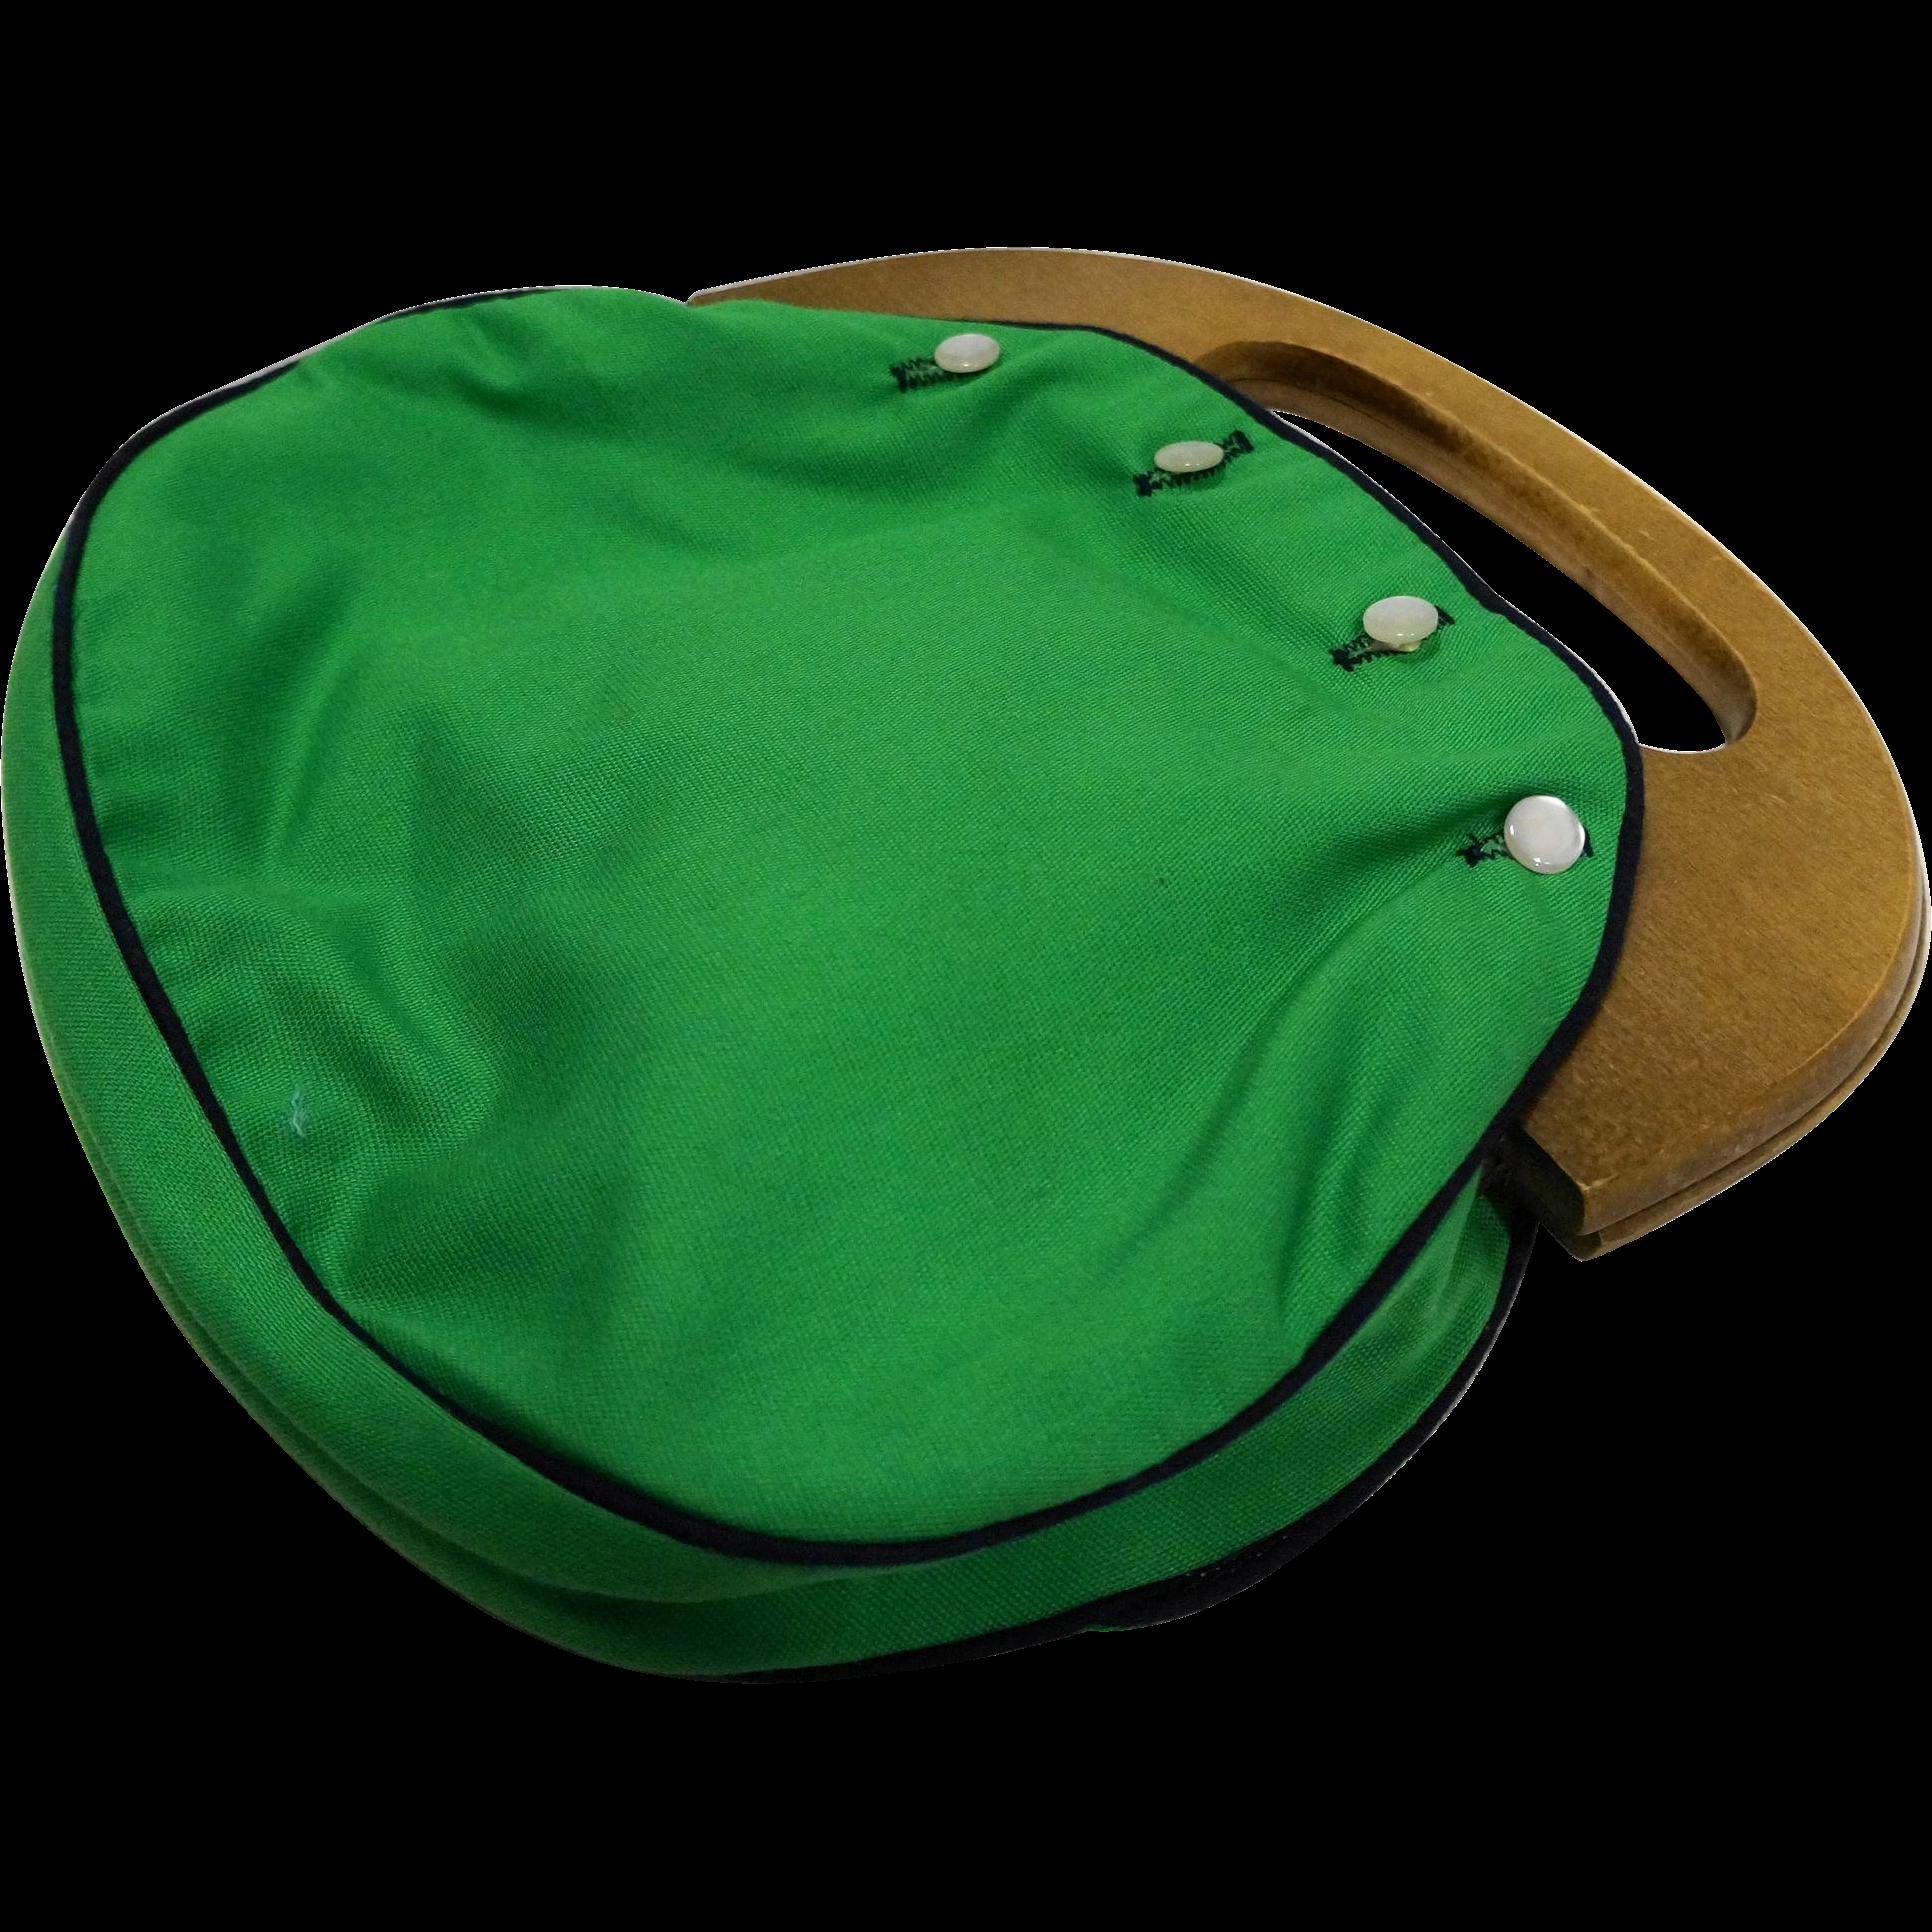 Bermuda Bag Purse Wooden Handle 2 Reversible Covers Blue Green Solids Floral Turtles